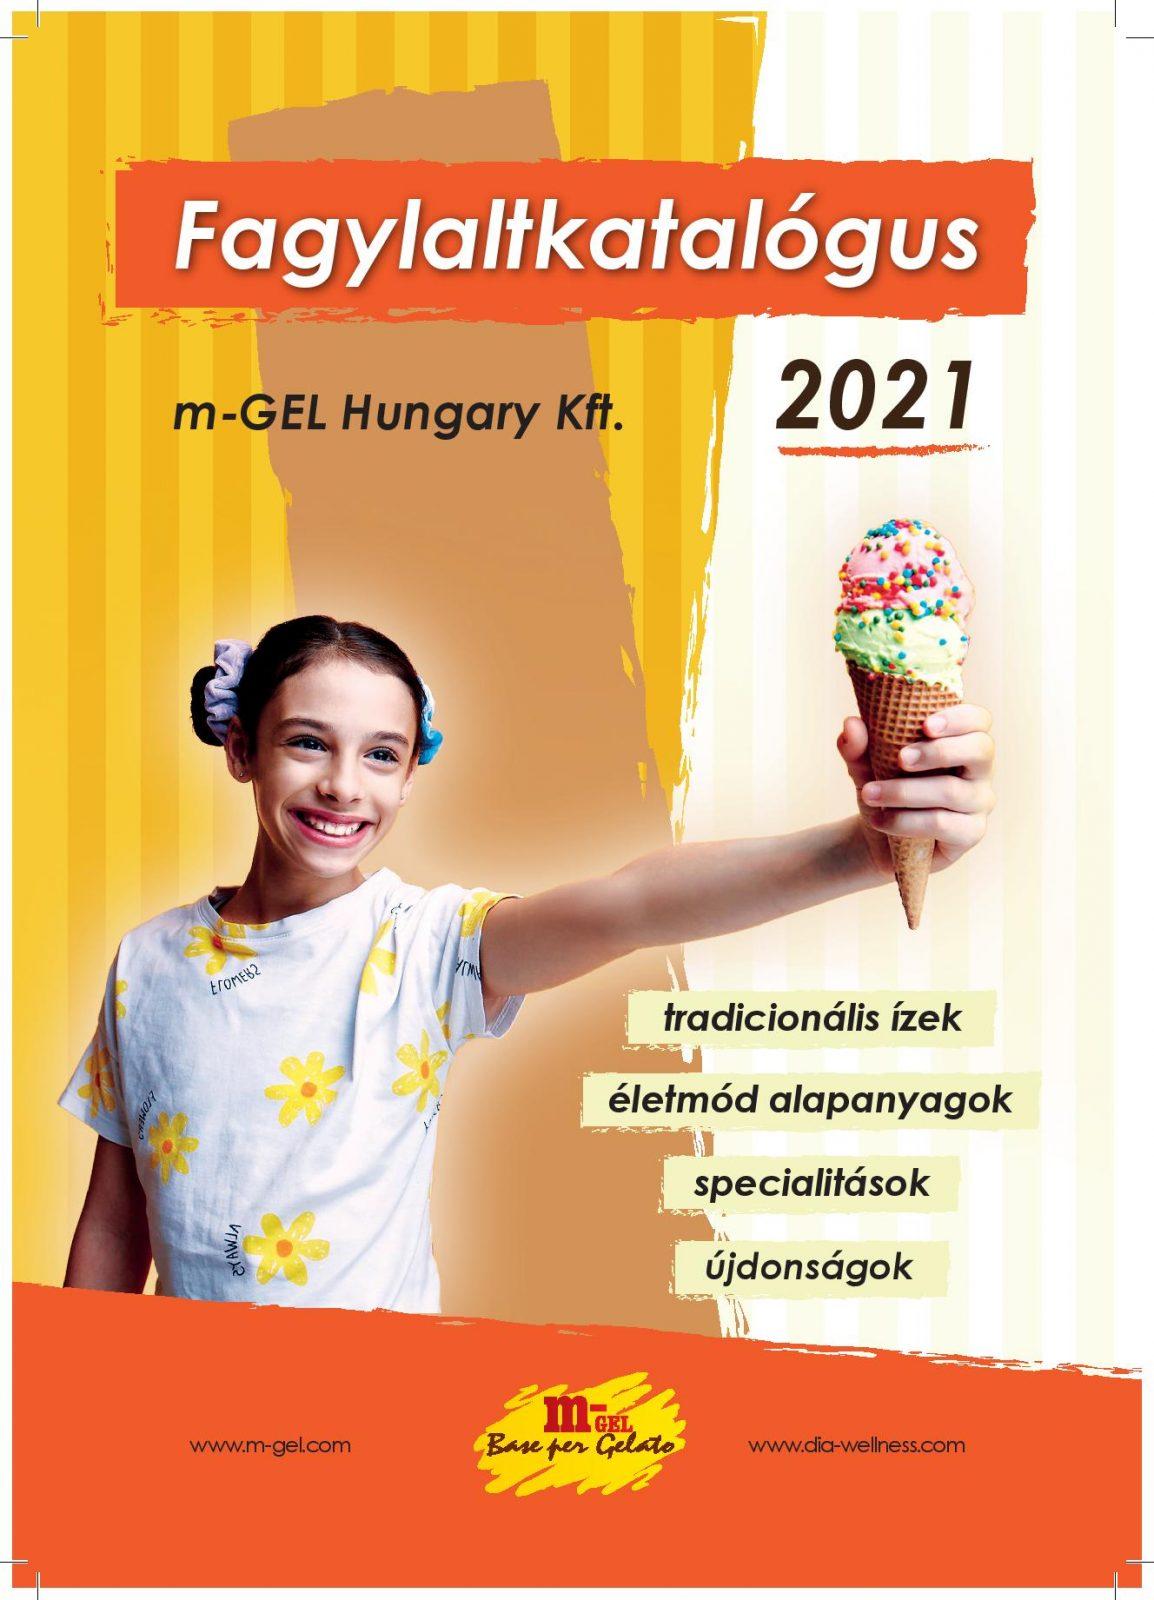 FAGYLALTKATALOGUS_2021_PRINT-page-001